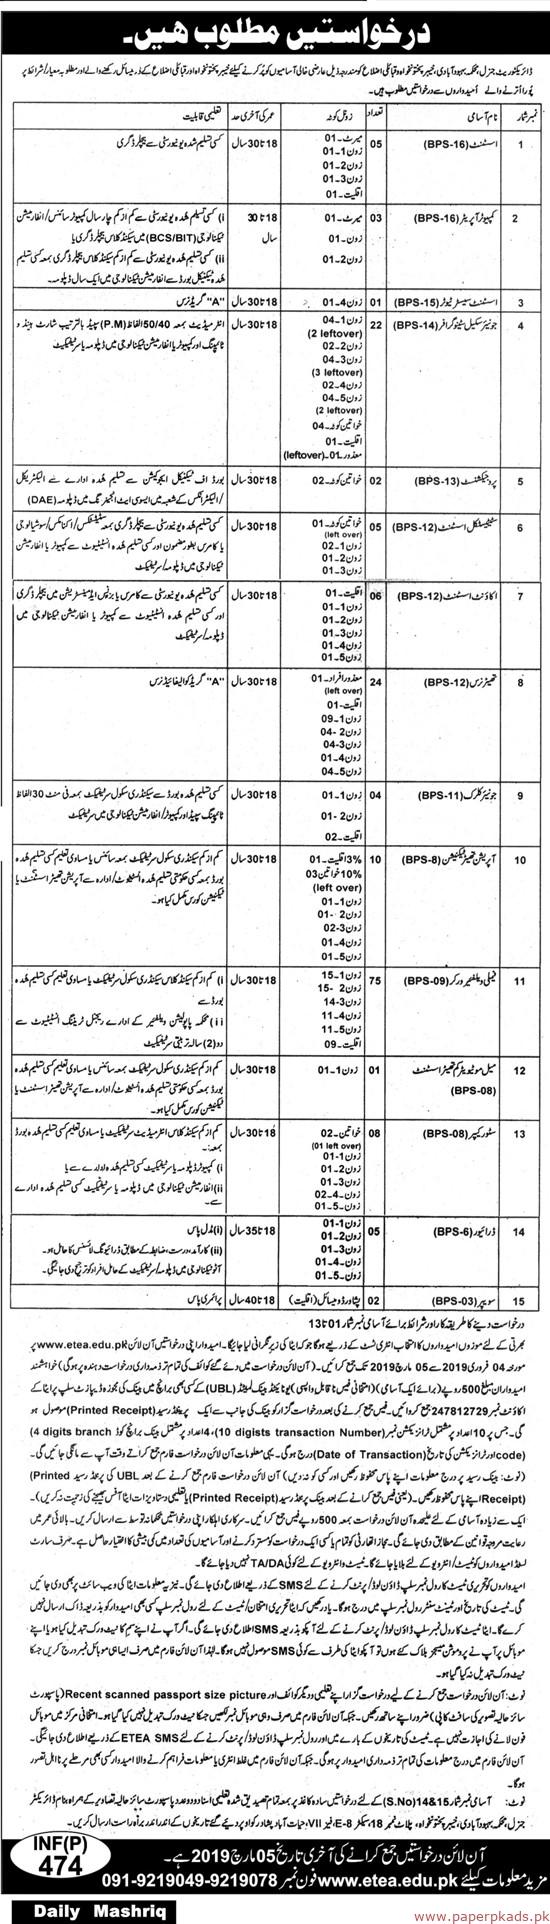 Population Welfare Department KPK Jobs 2019 Peshawar Form Apply Online